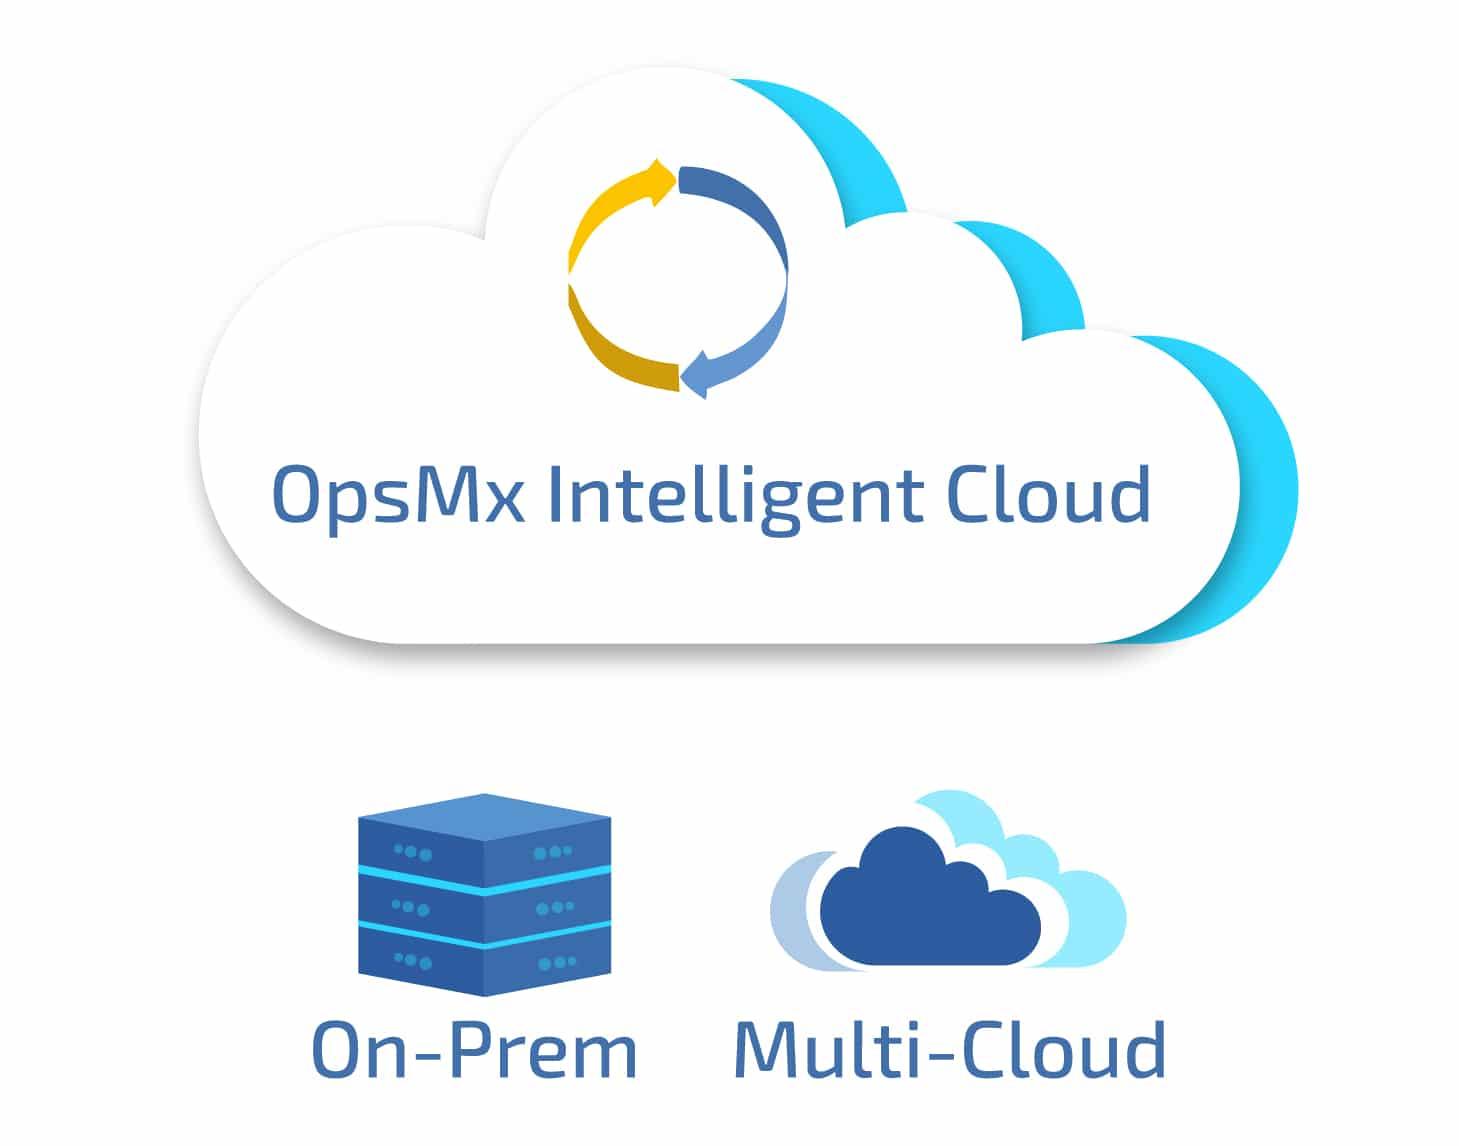 OpsMx Intelligent Cloud